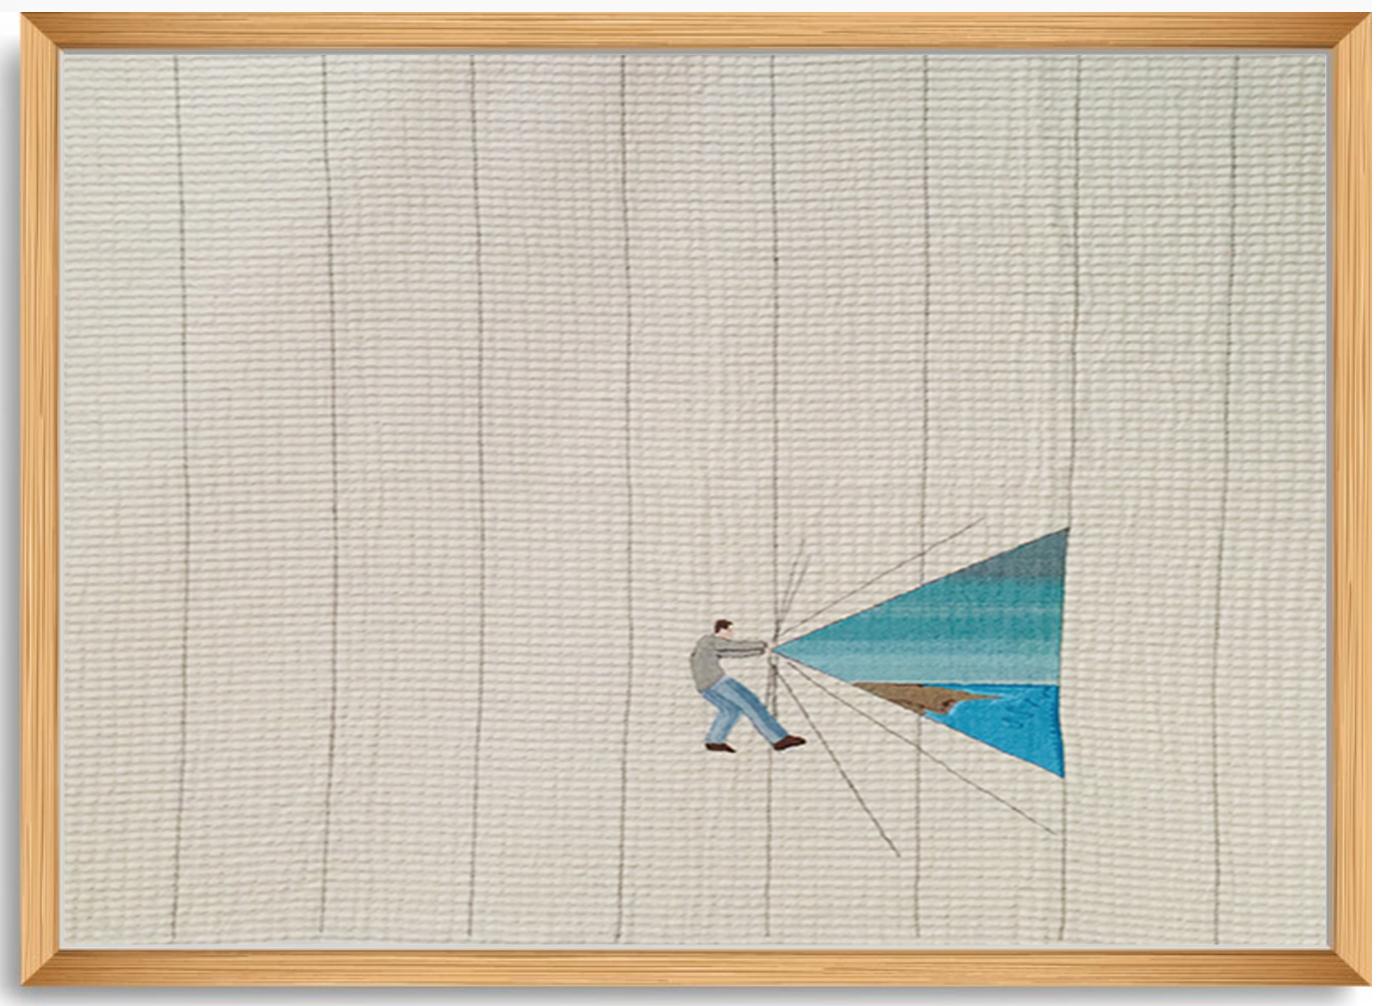 man and wall textile.jpg